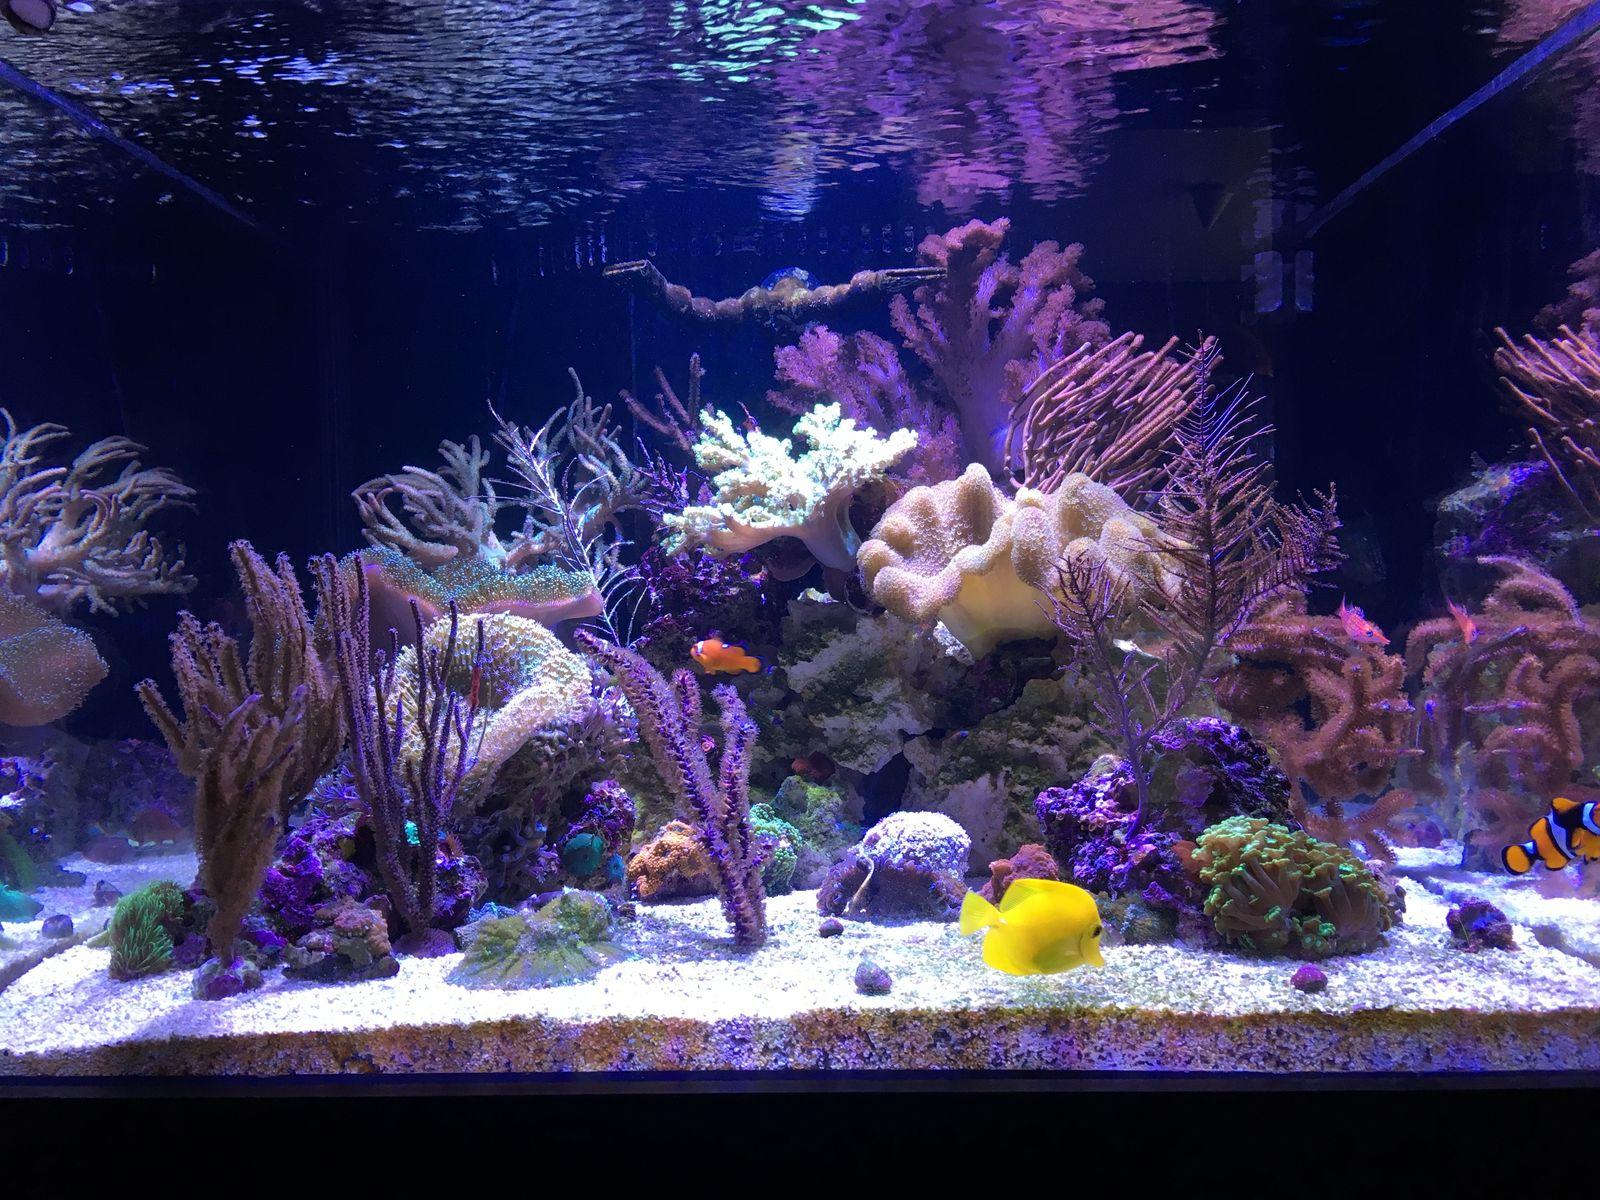 sharbuckles 78g starphire cube large reefs nano reef com community